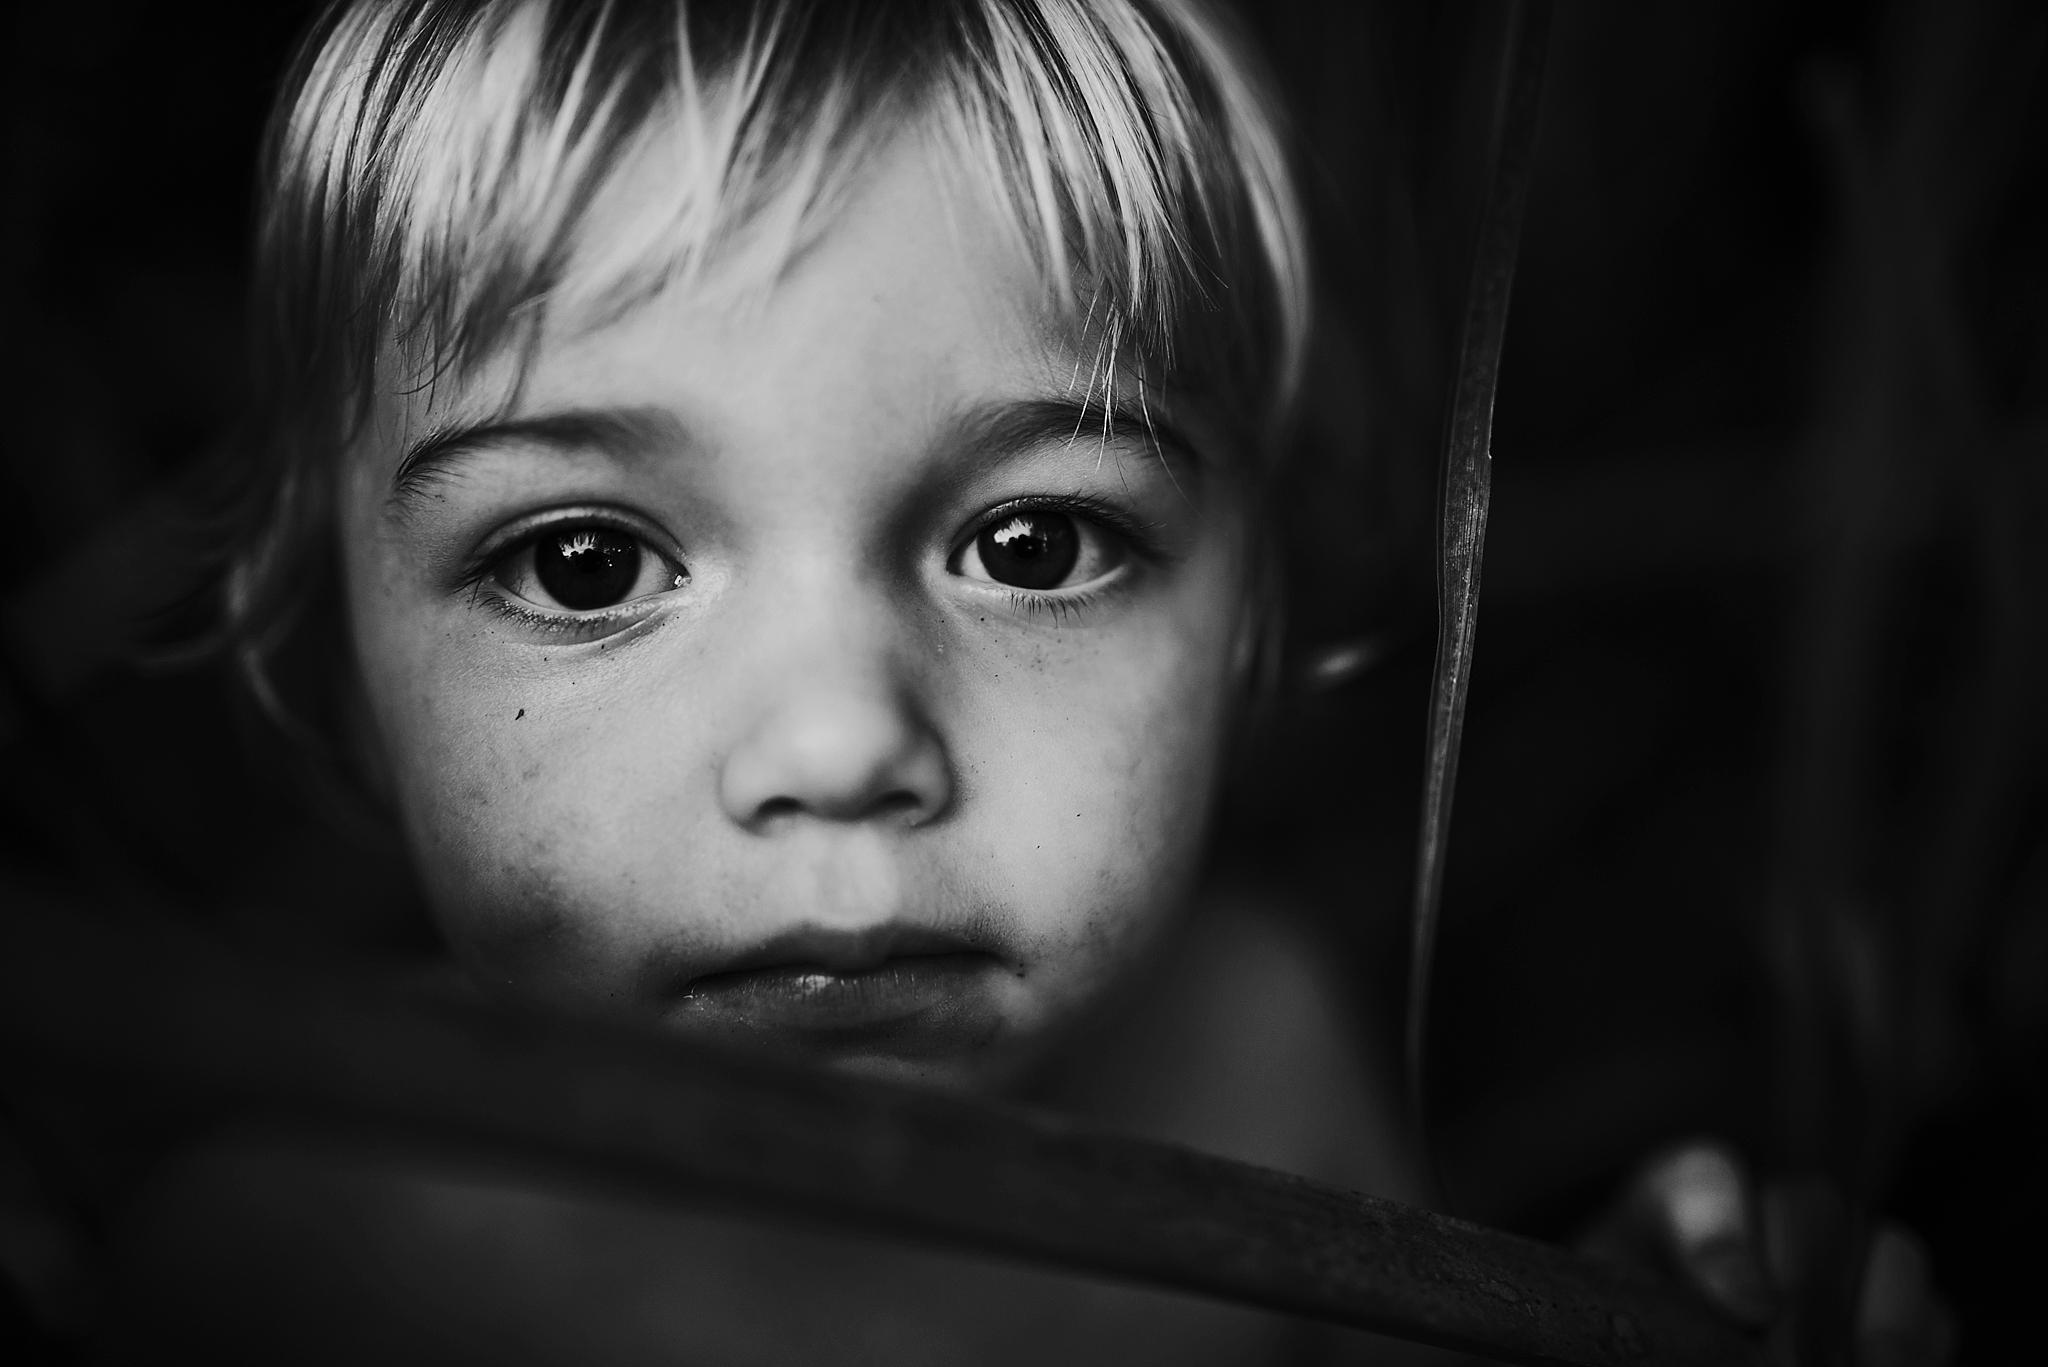 twyla jones photography - treasure coast - florida family photography riverbend park jupiter florida-6131.jpg